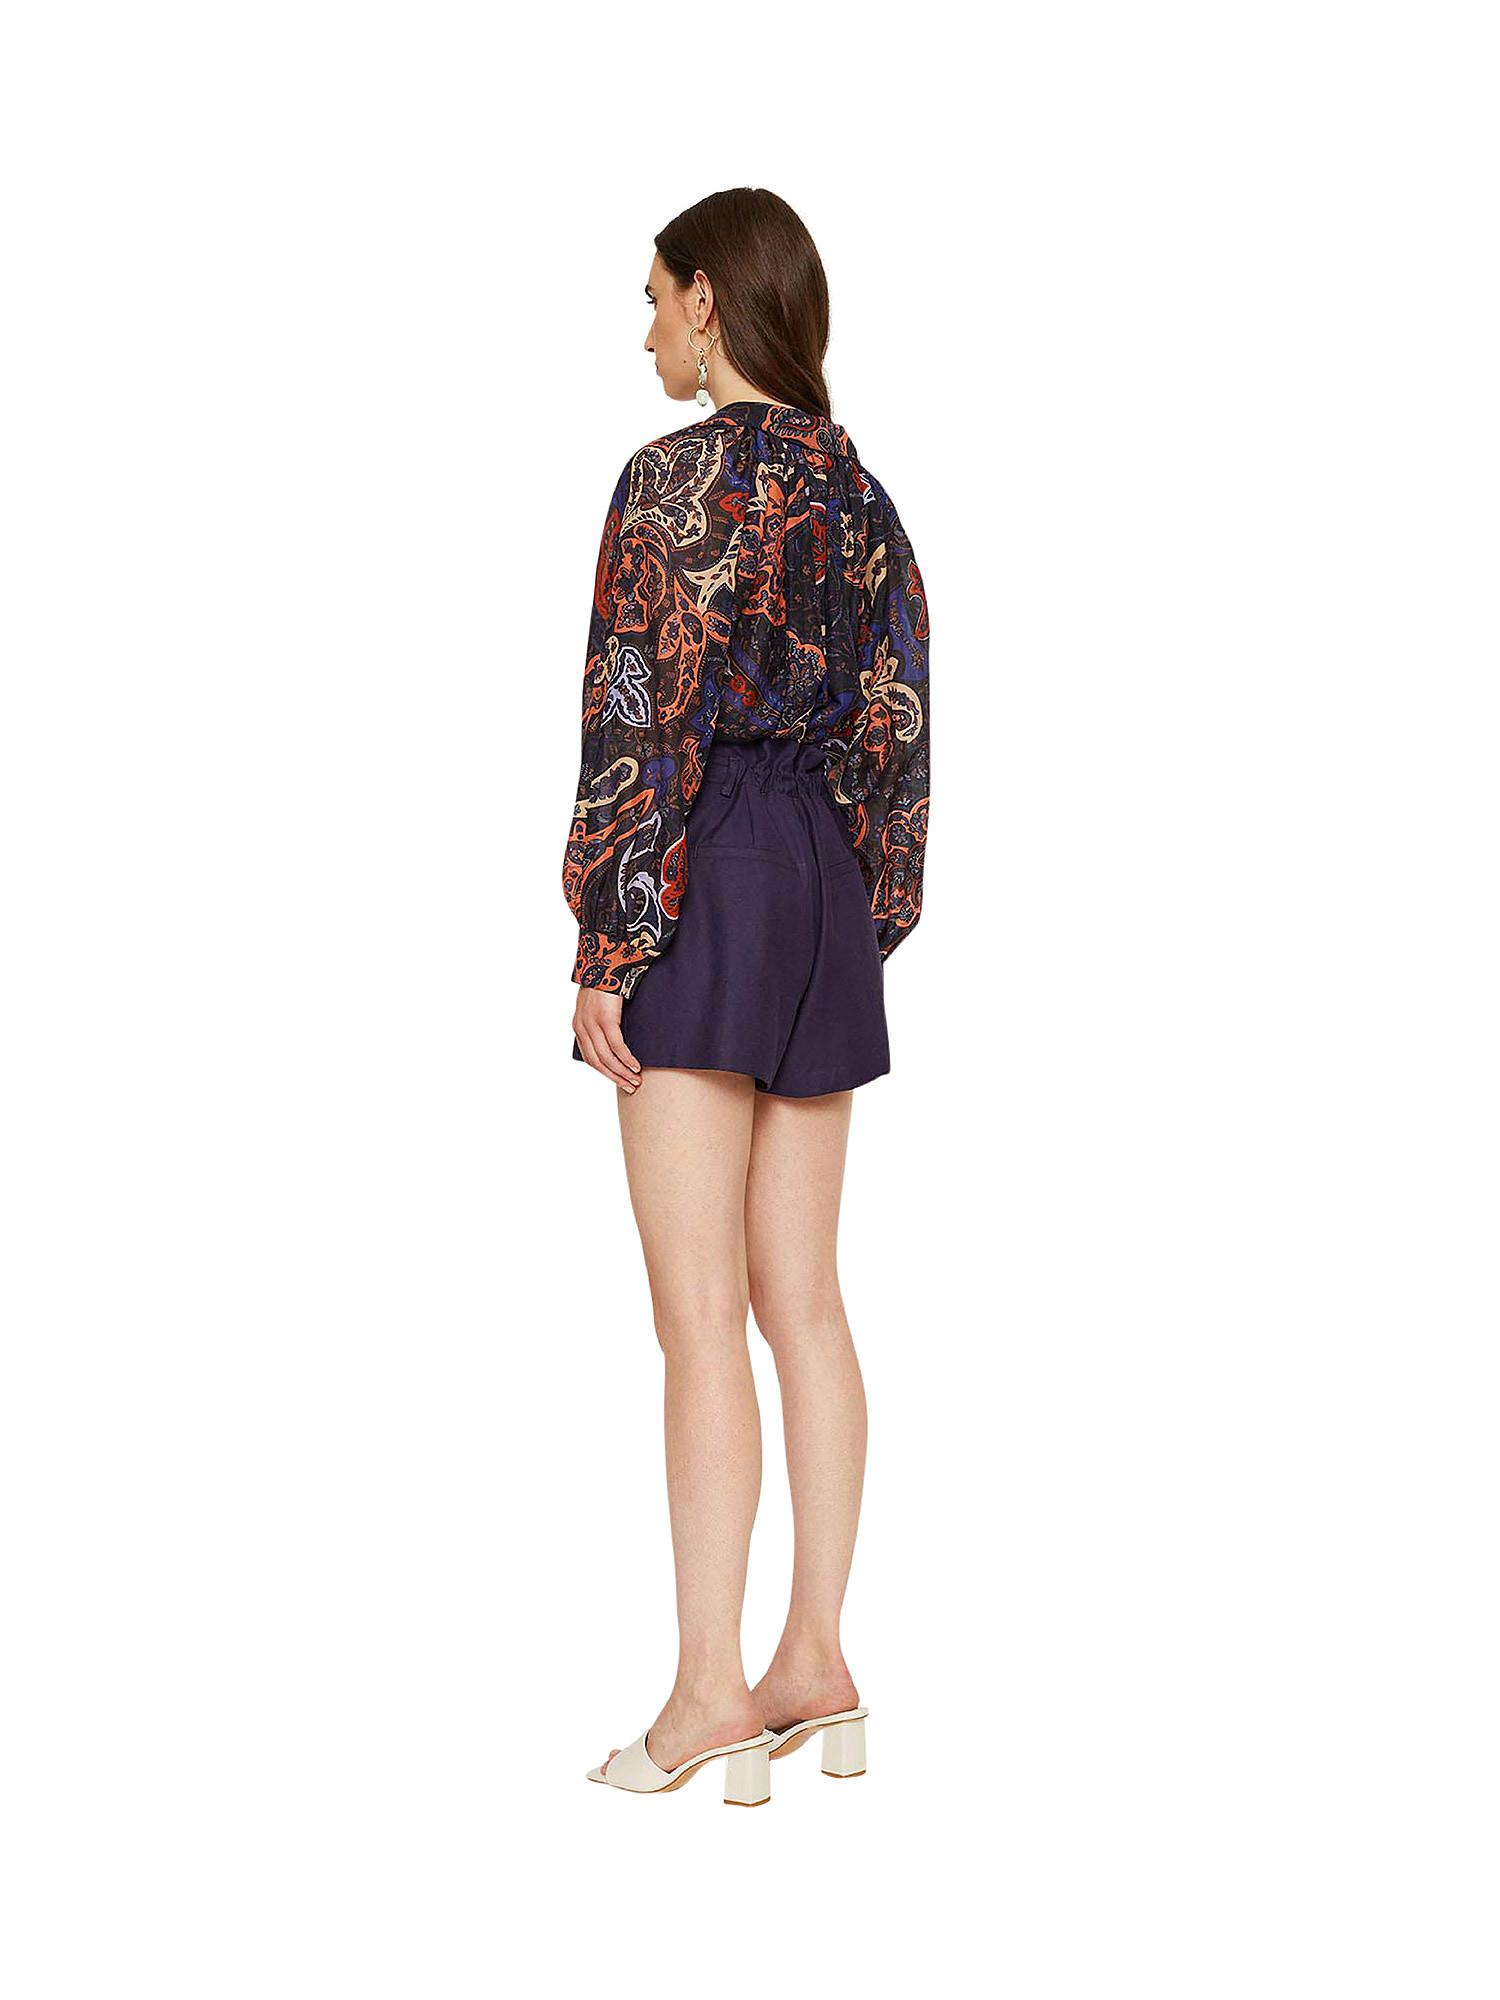 Shorts in shantung Ginger, Viola lilla, large image number 5